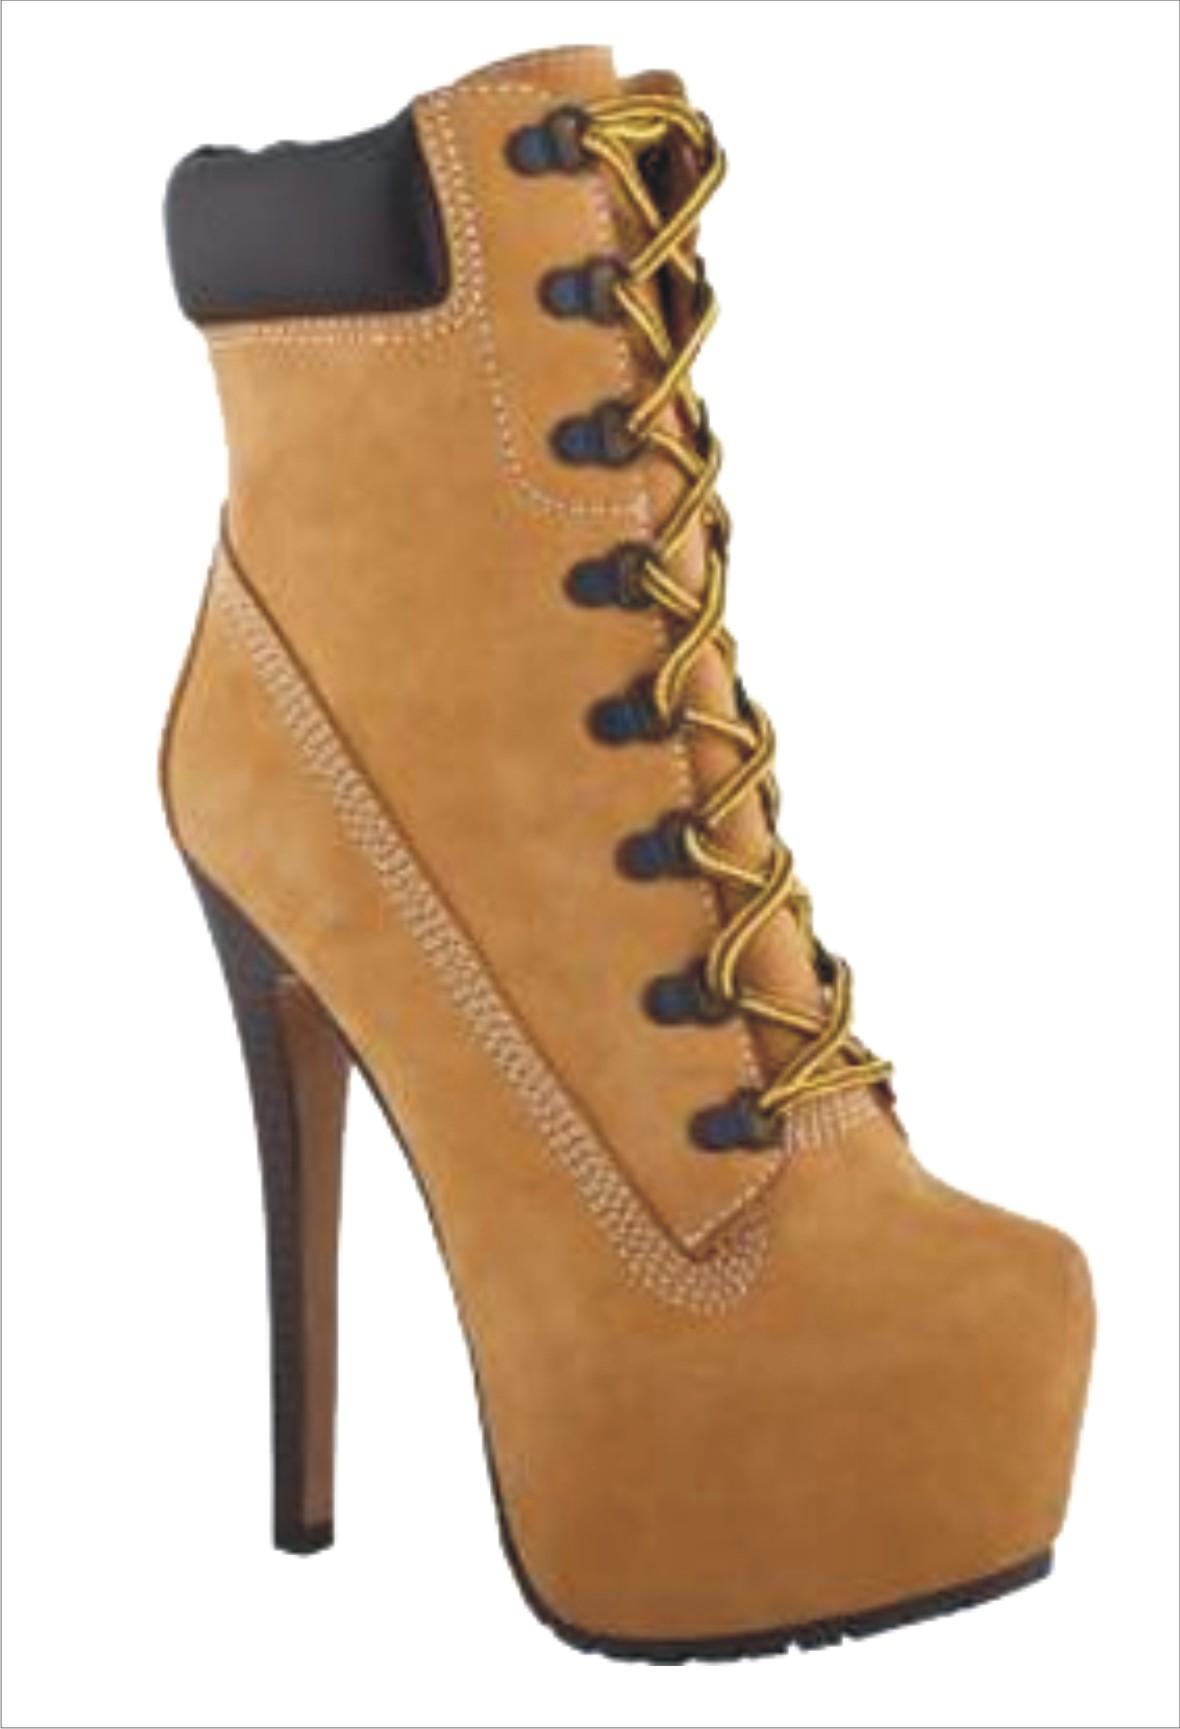 Timberland Boots DivaInDenimsampSneakers